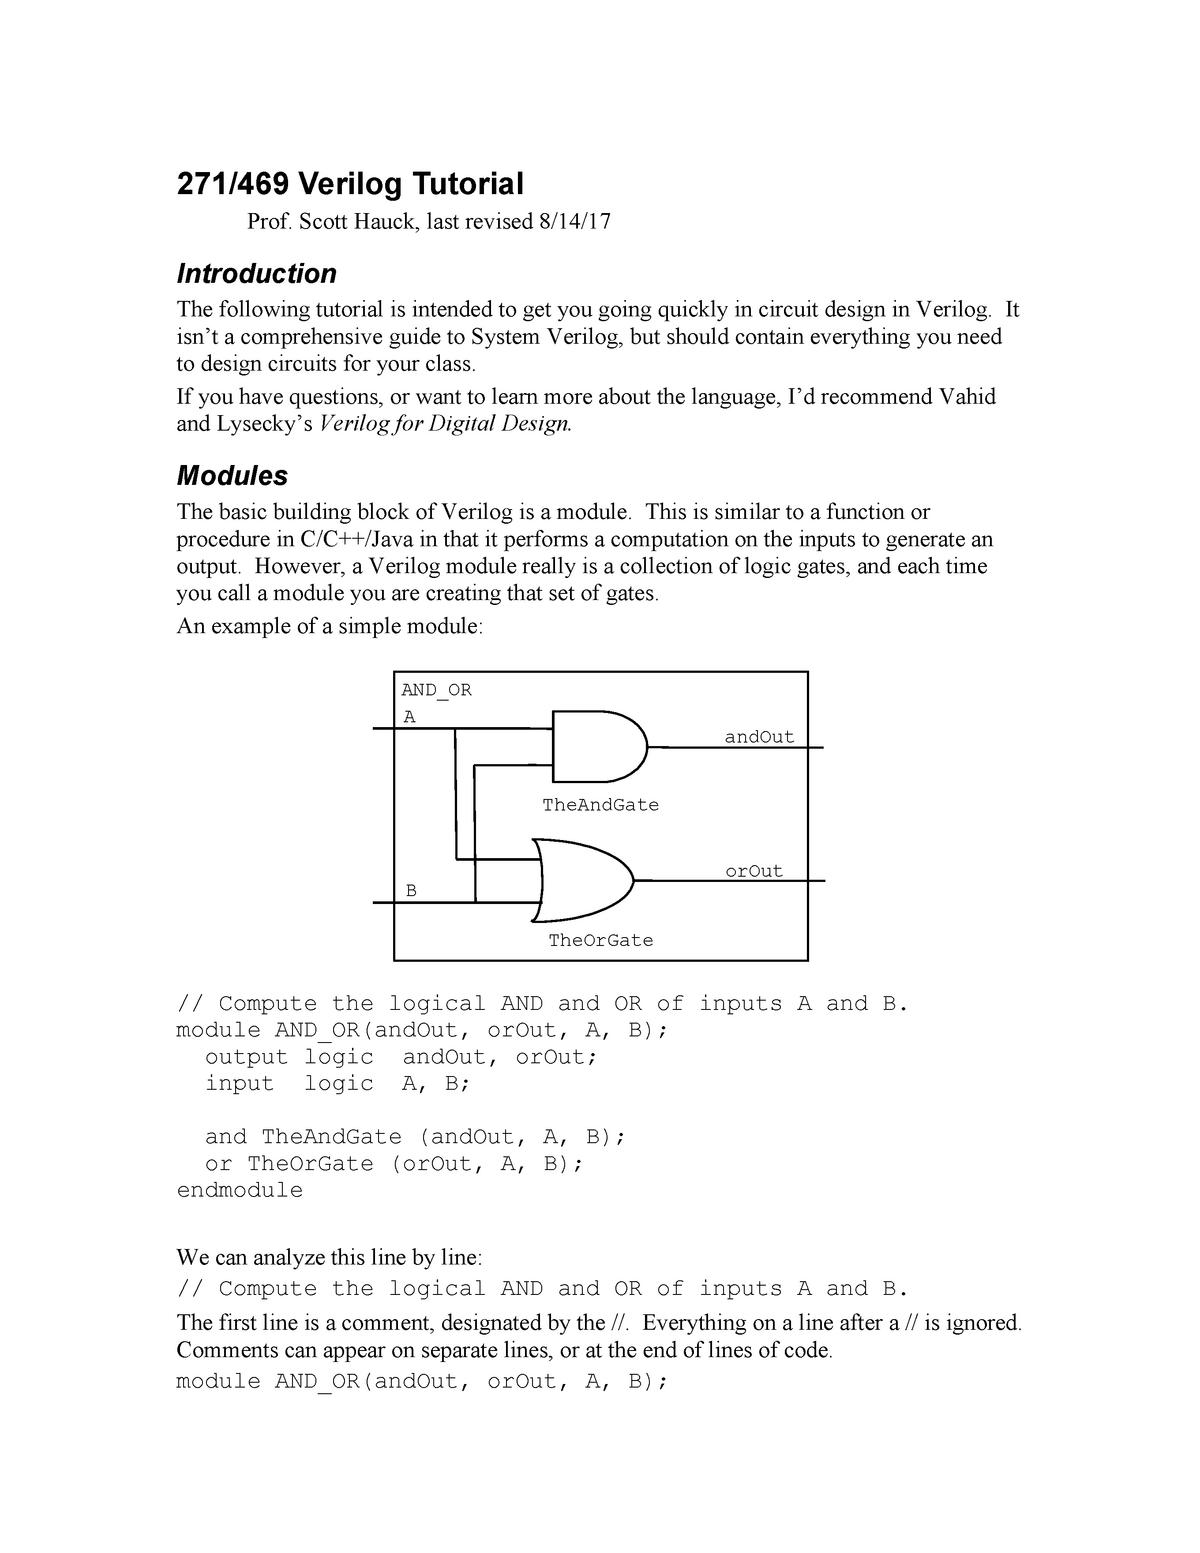 System Verilog Tutorial - MICROM800: Electric Circuits Laboratory